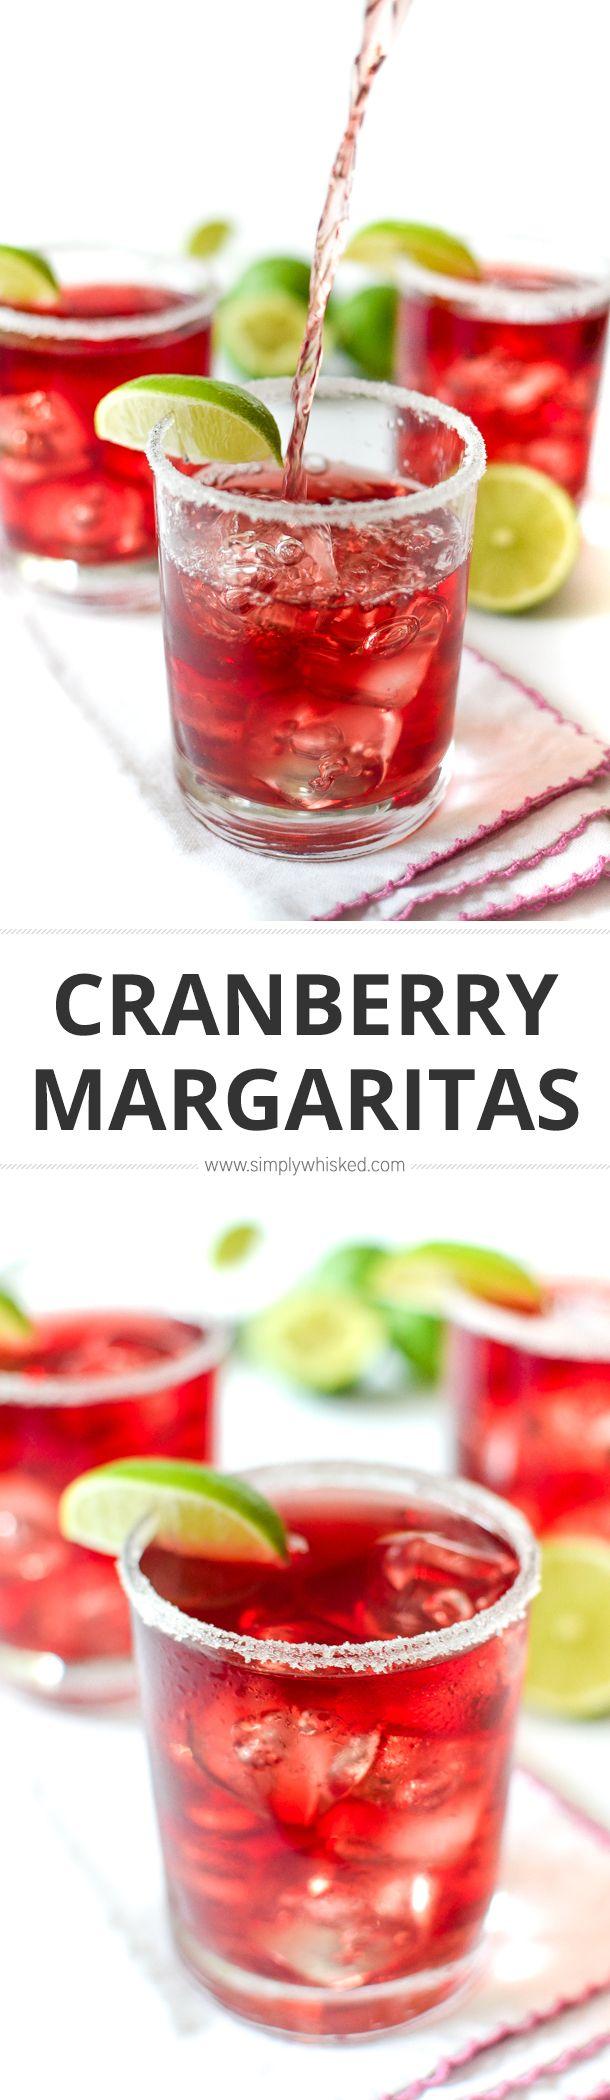 Easy Cranberry Margaritas | @simplywhisked                                                                                                                                                                                 More